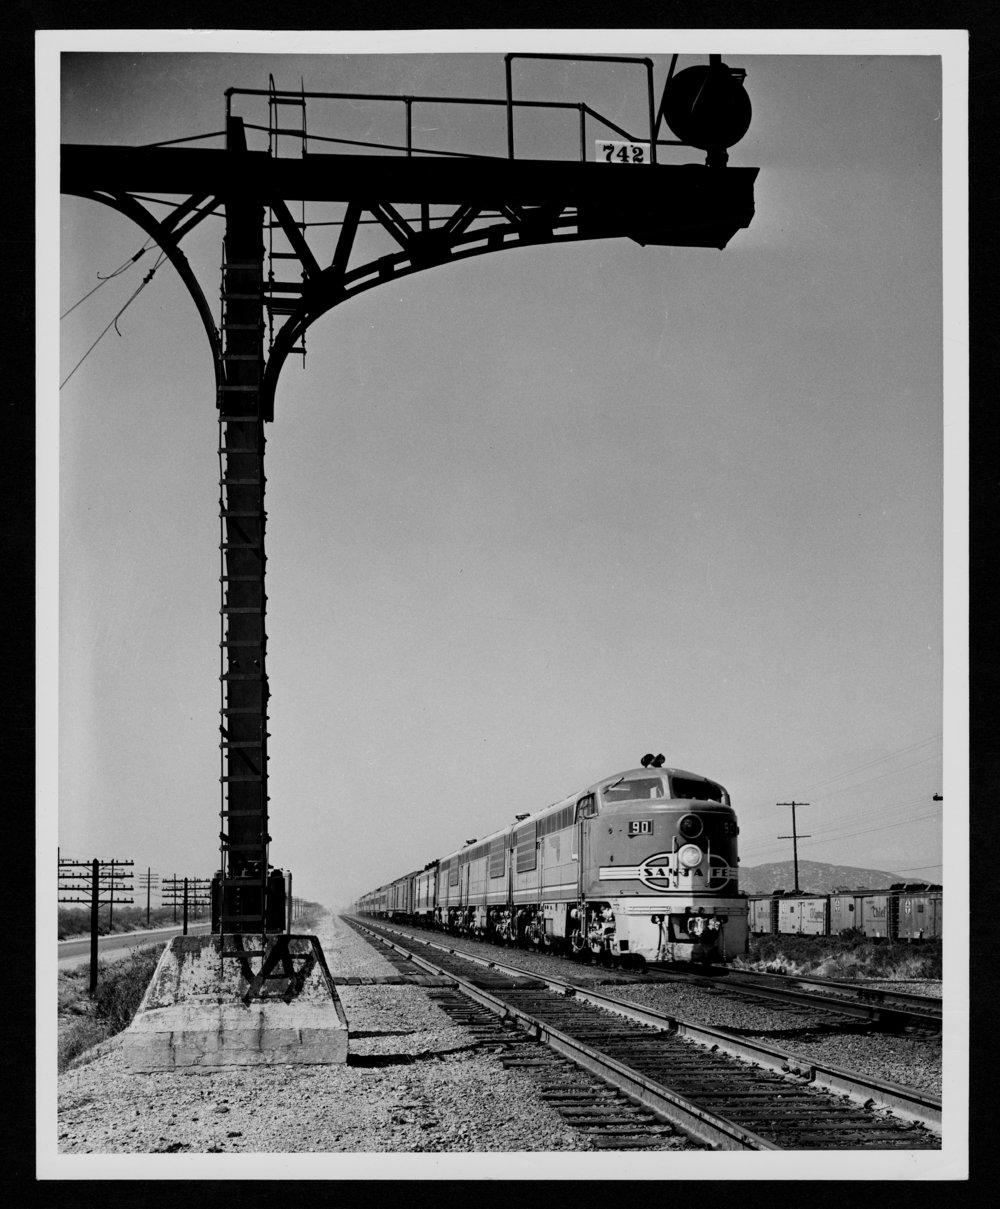 Atchison, Topeka & Santa Fe Railway Company's diesel engine - 1